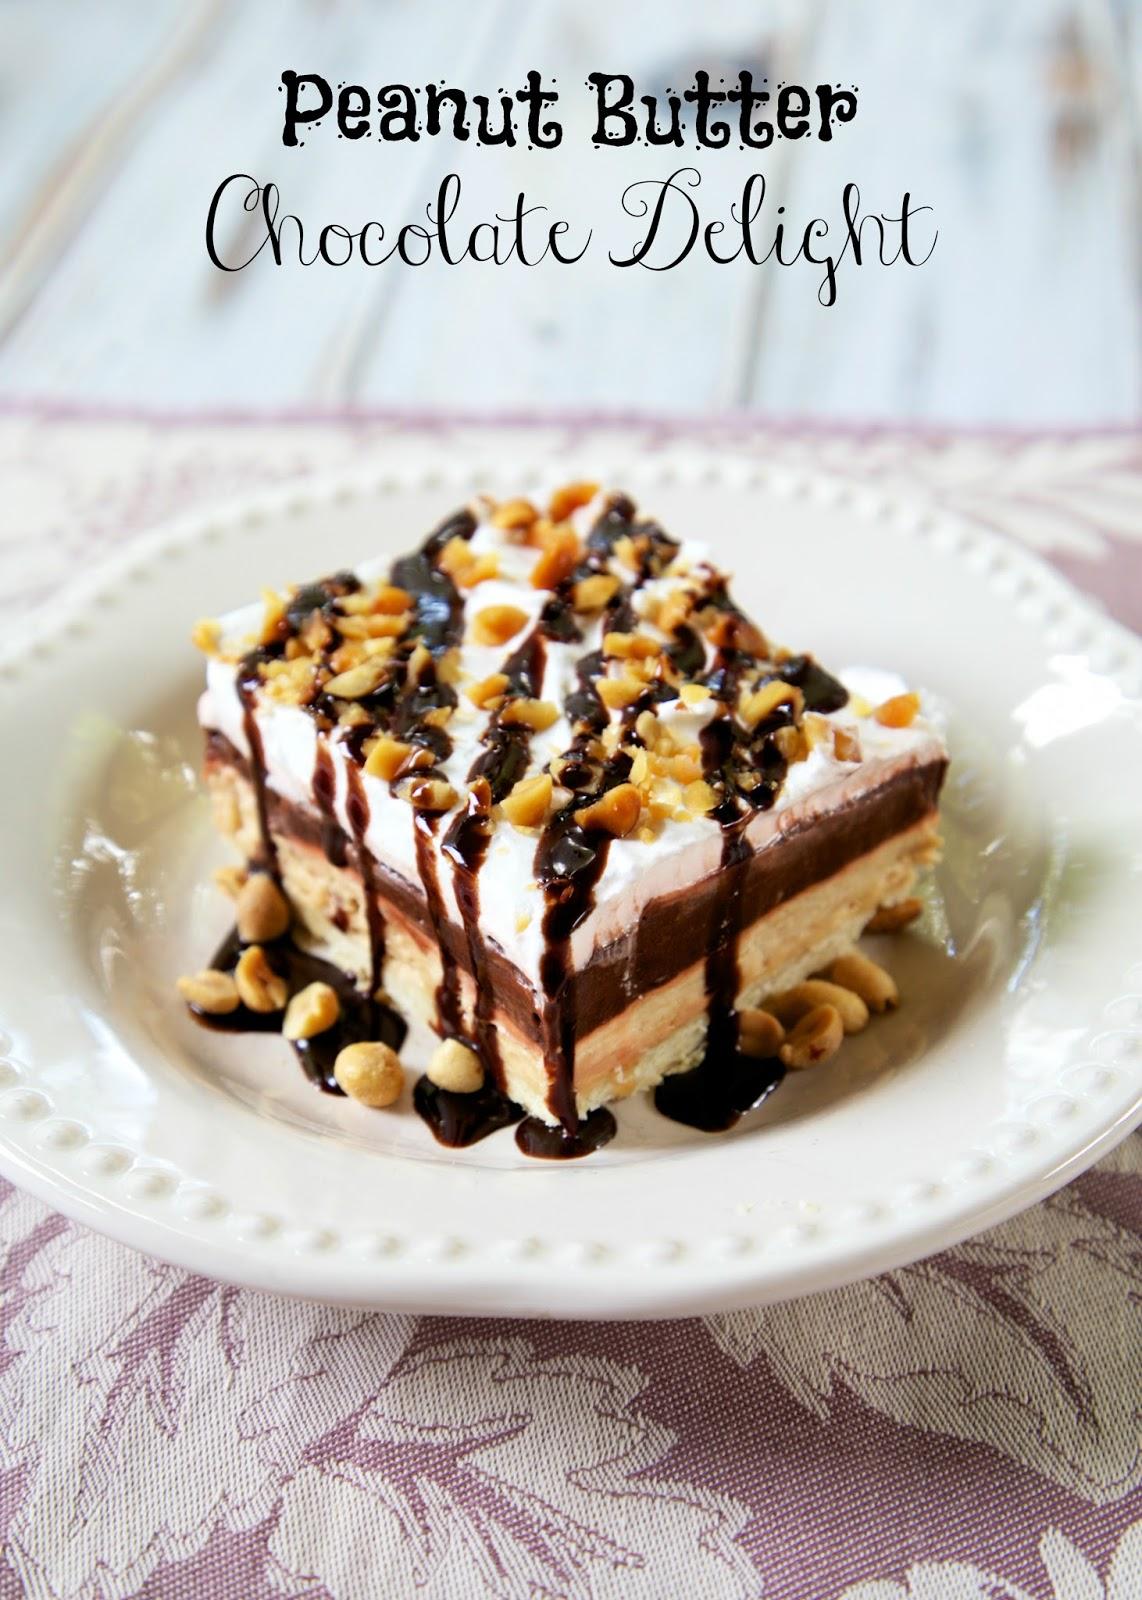 Peanut Butter Chocolate Delight Plain Chicken